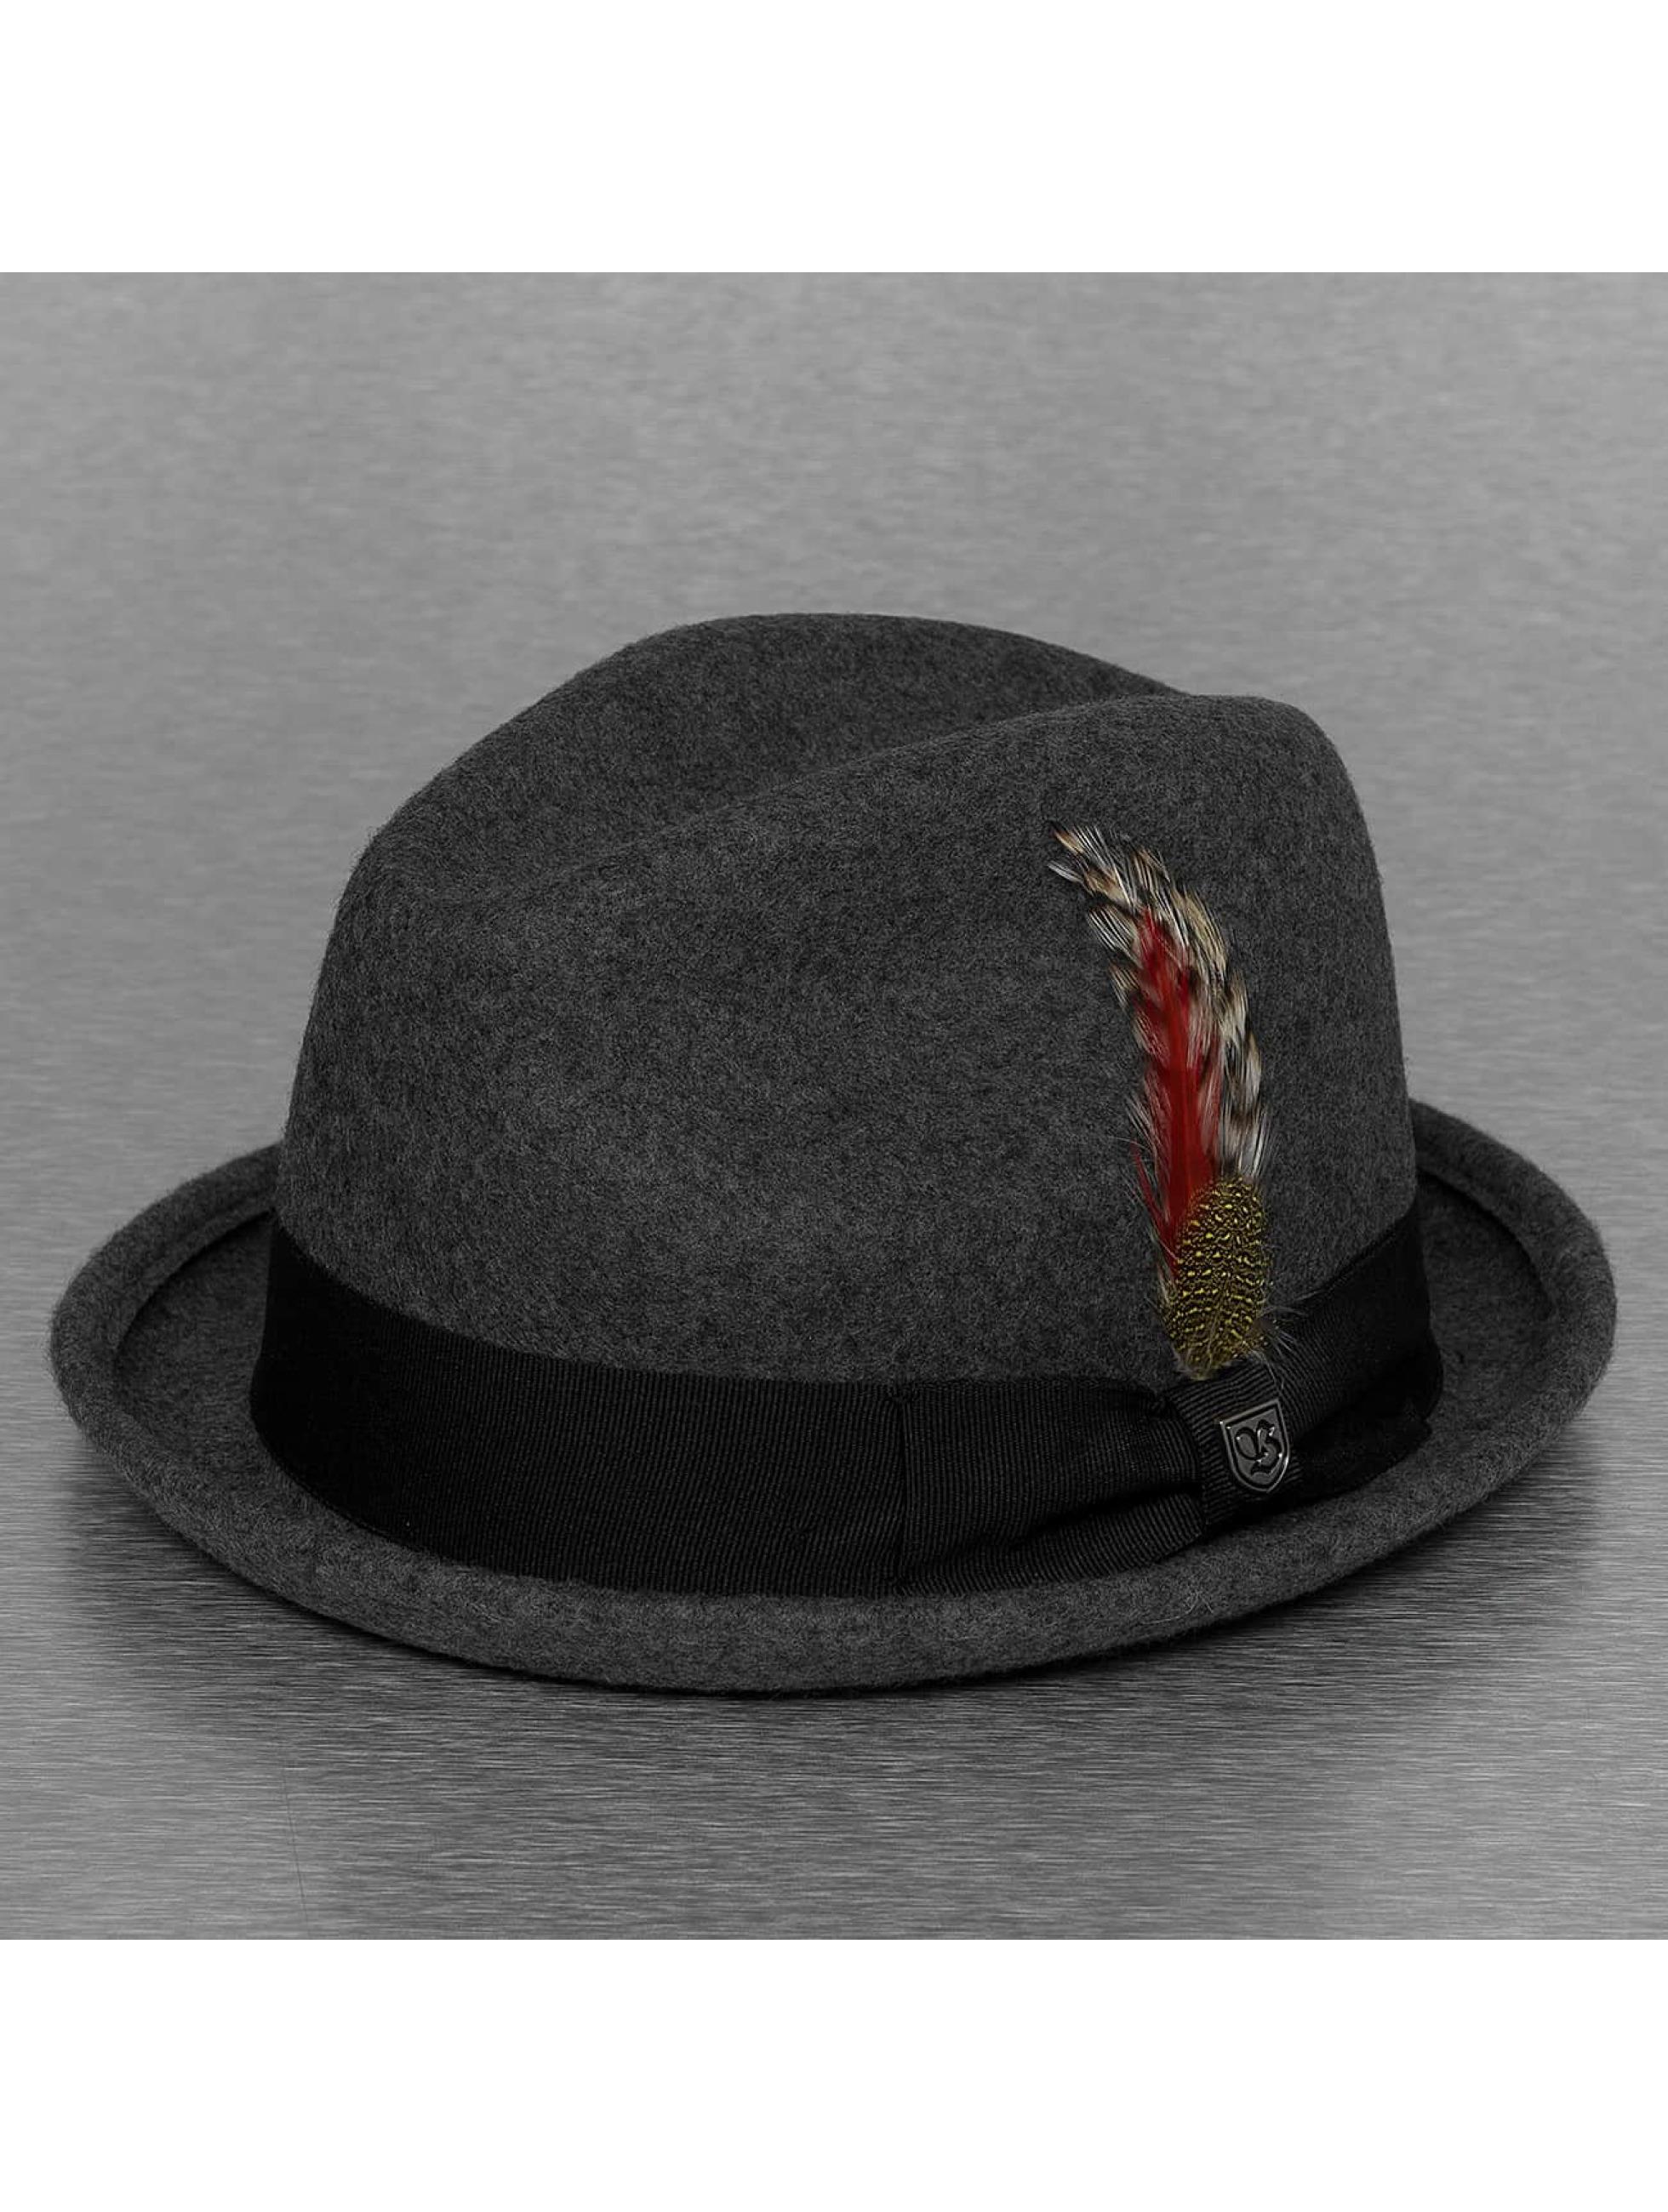 Brixton Männer,Frauen Hut Gain in grau